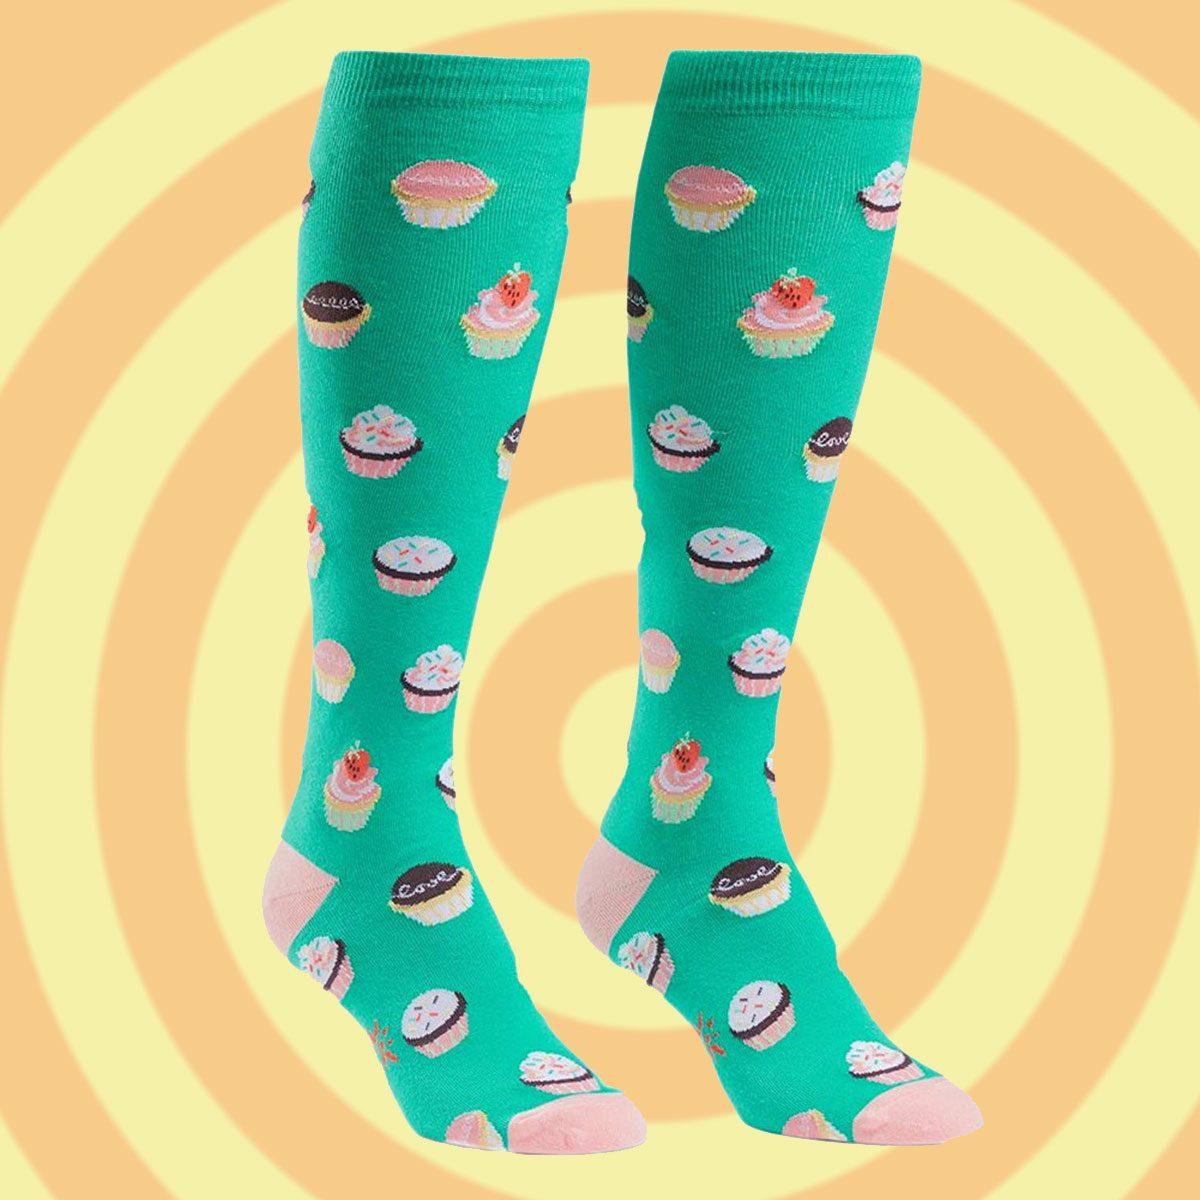 Cupcake knee socks